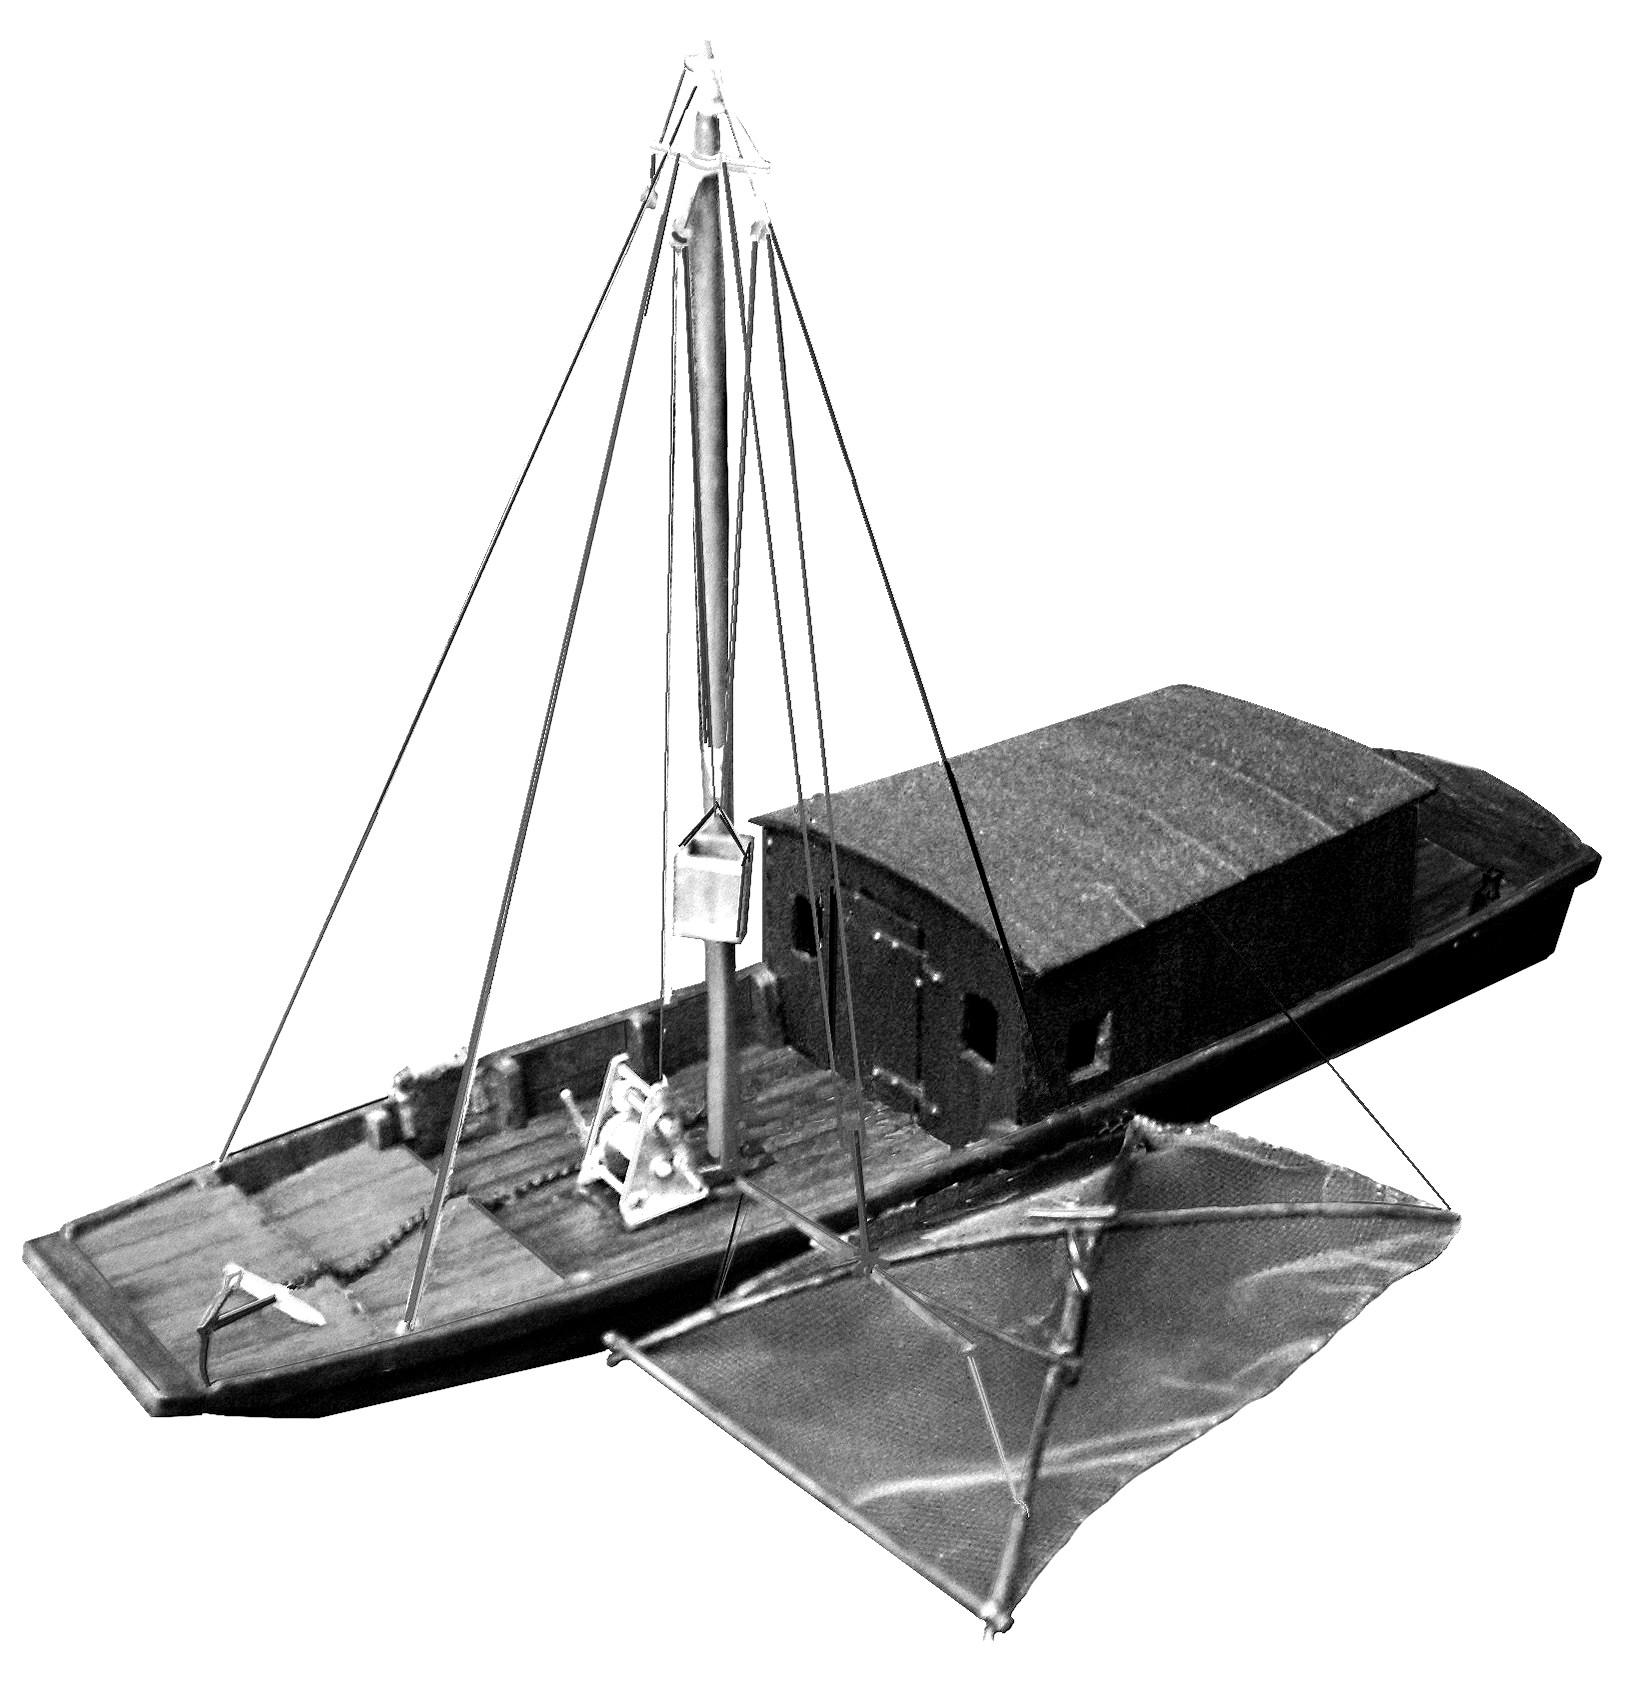 1 Toue de pêche de basse Loire - Transp  - .JPG